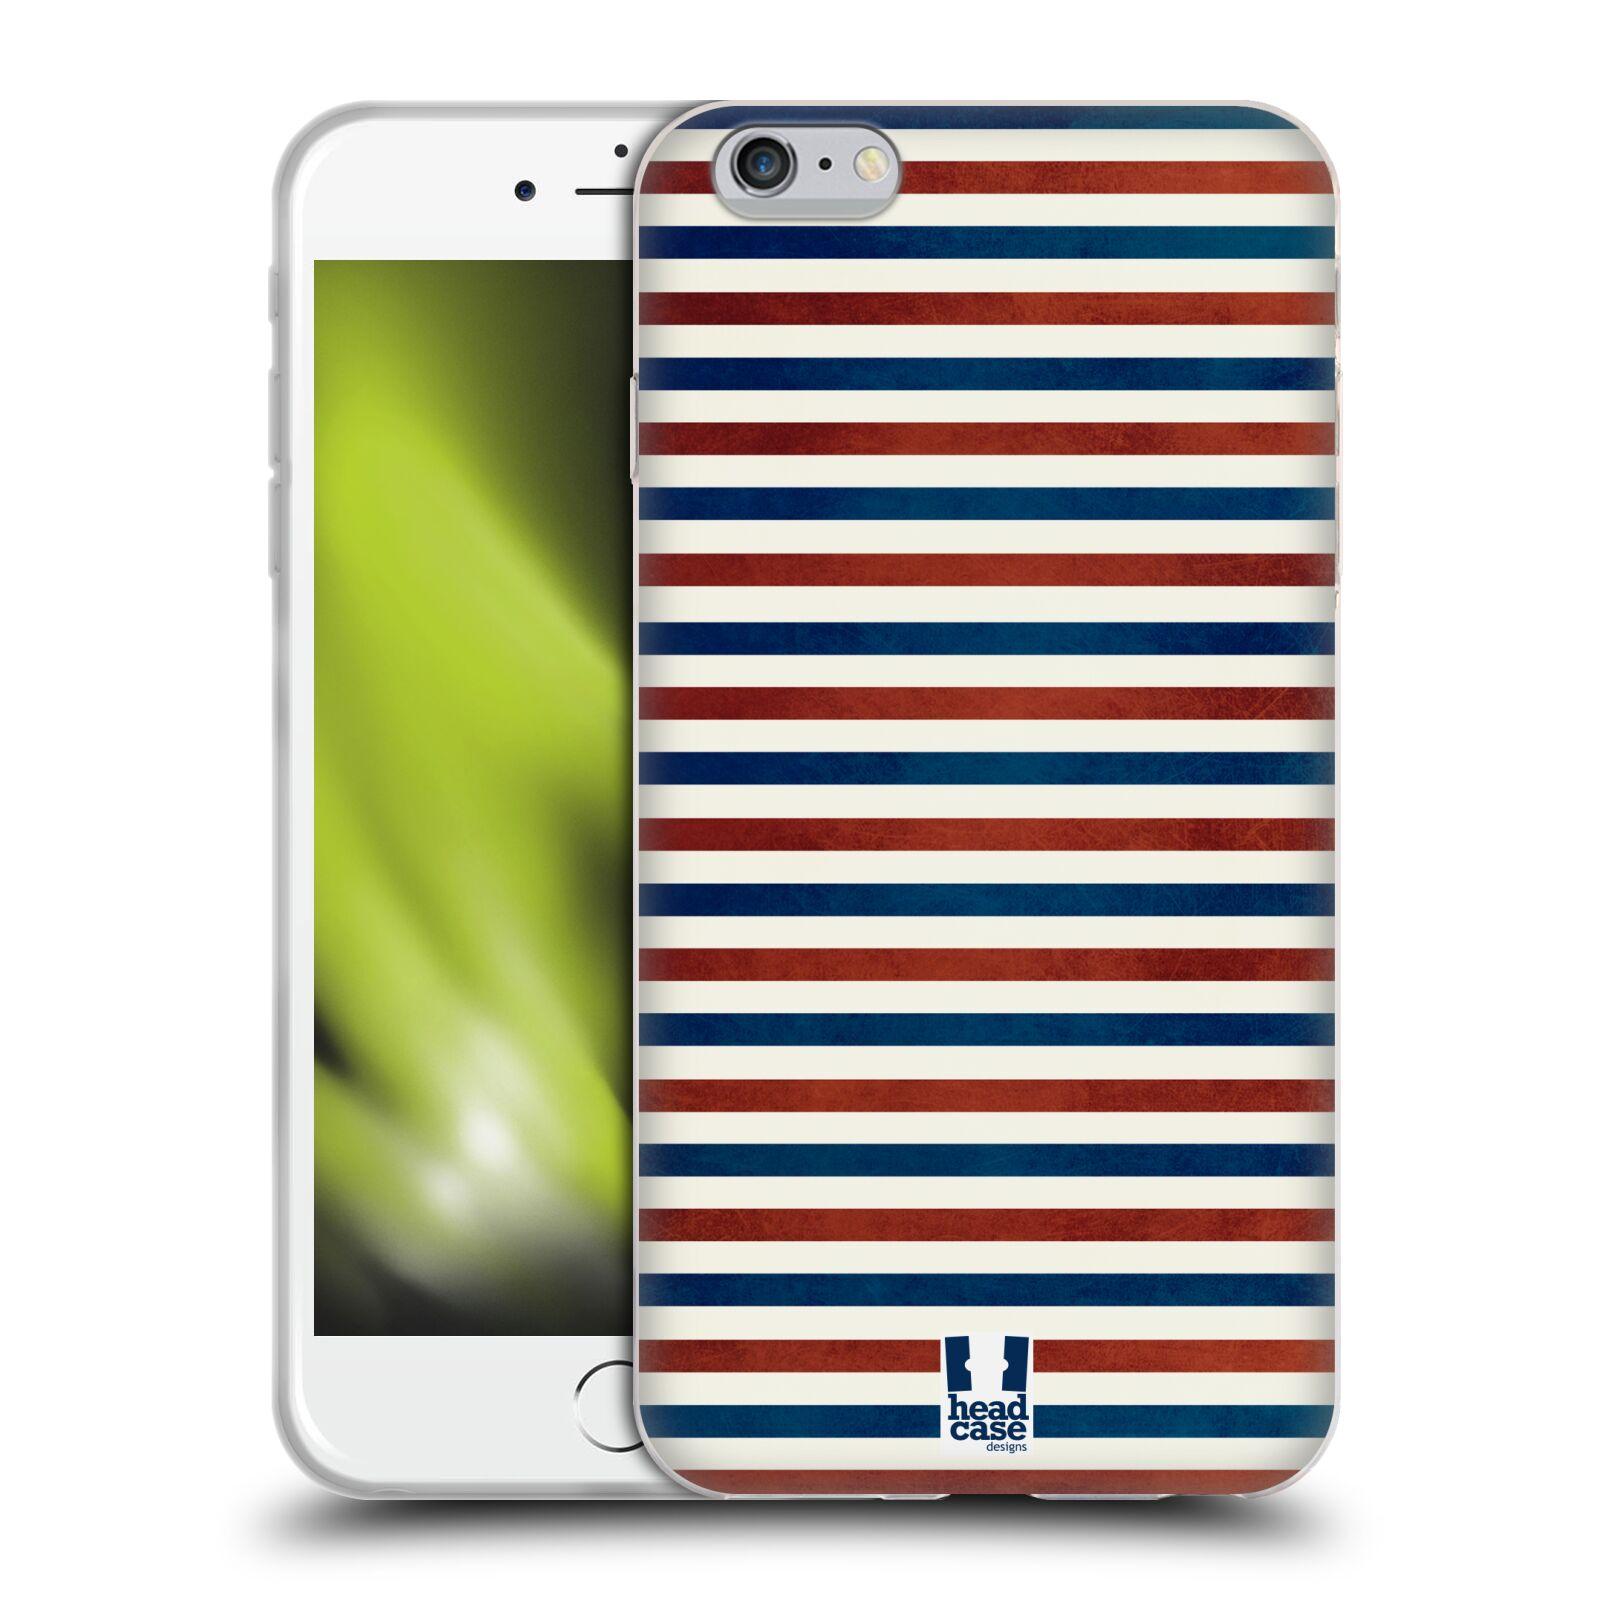 HEAD CASE silikonový obal na mobil Apple Iphone 6 PLUS/ 6S PLUS vzor USA VLAJKA ČERVENÉ A MODRÉ PROUŽKY